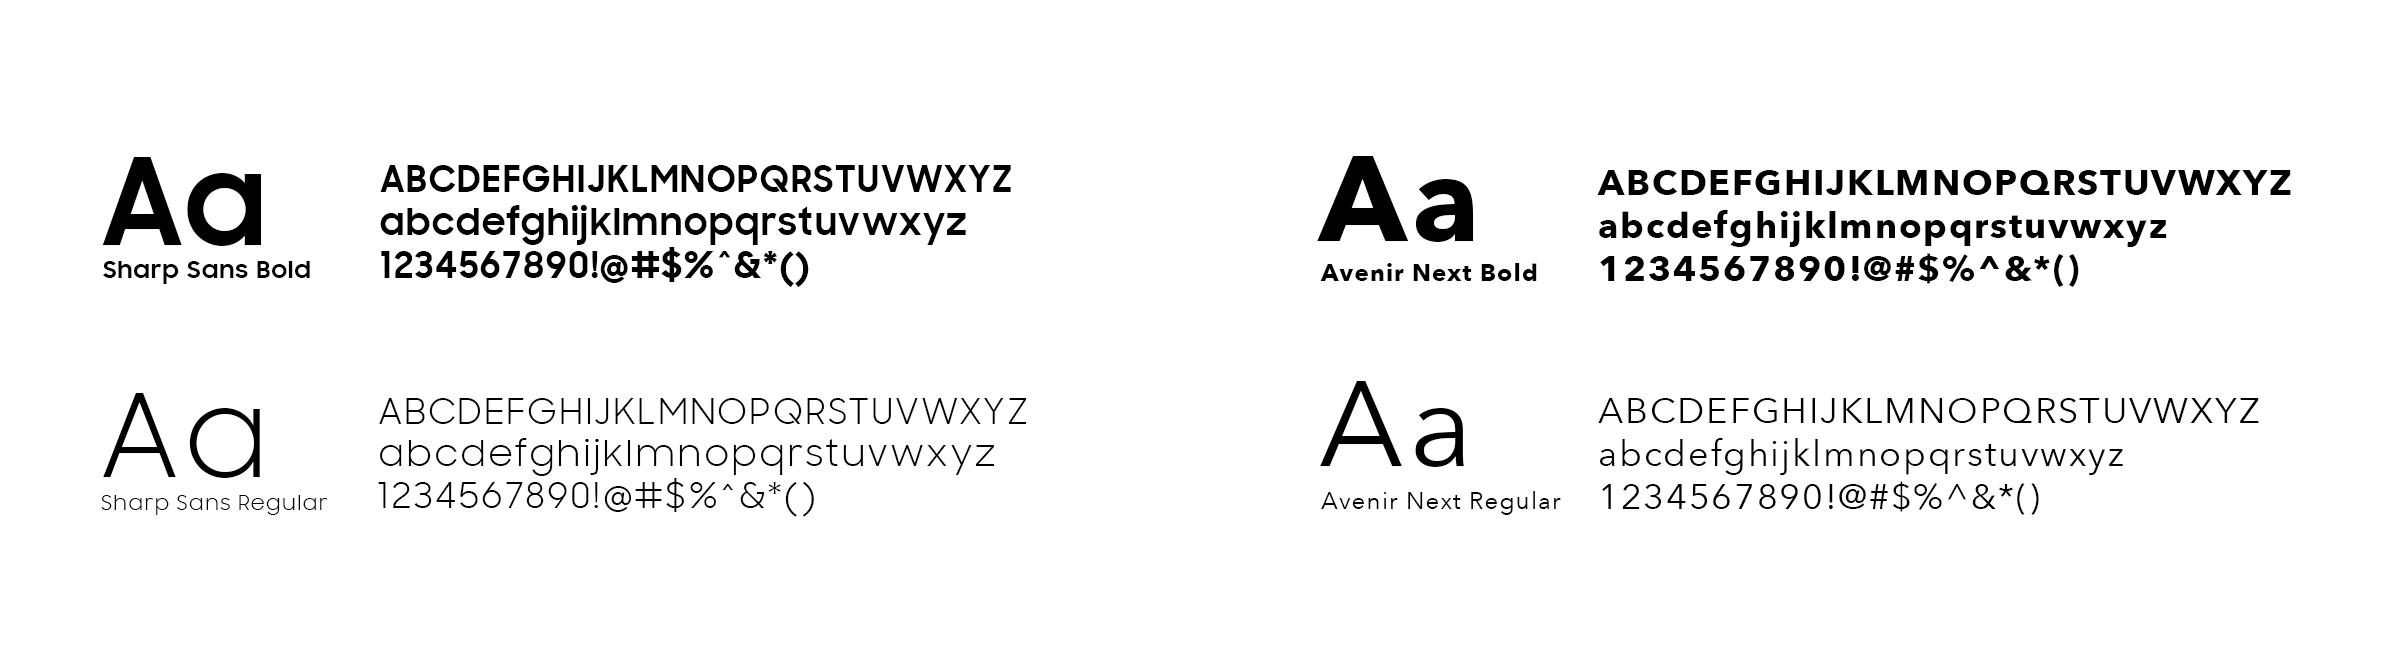 jacket typography.jpg